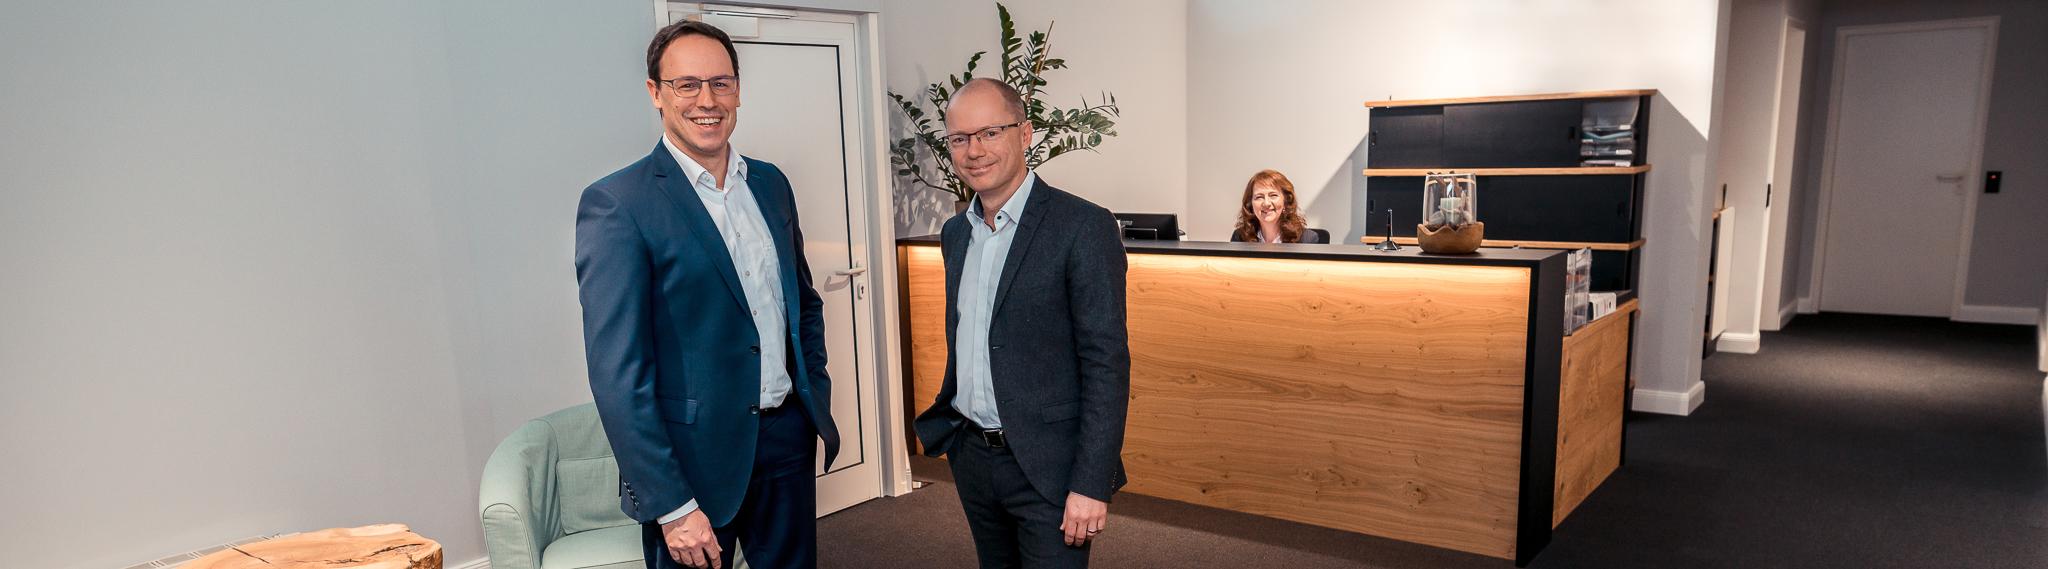 Steuerberatung, Wirtschaftsprüfung, Rechtsberatung - Kanzlei HRZ Penzberg, München